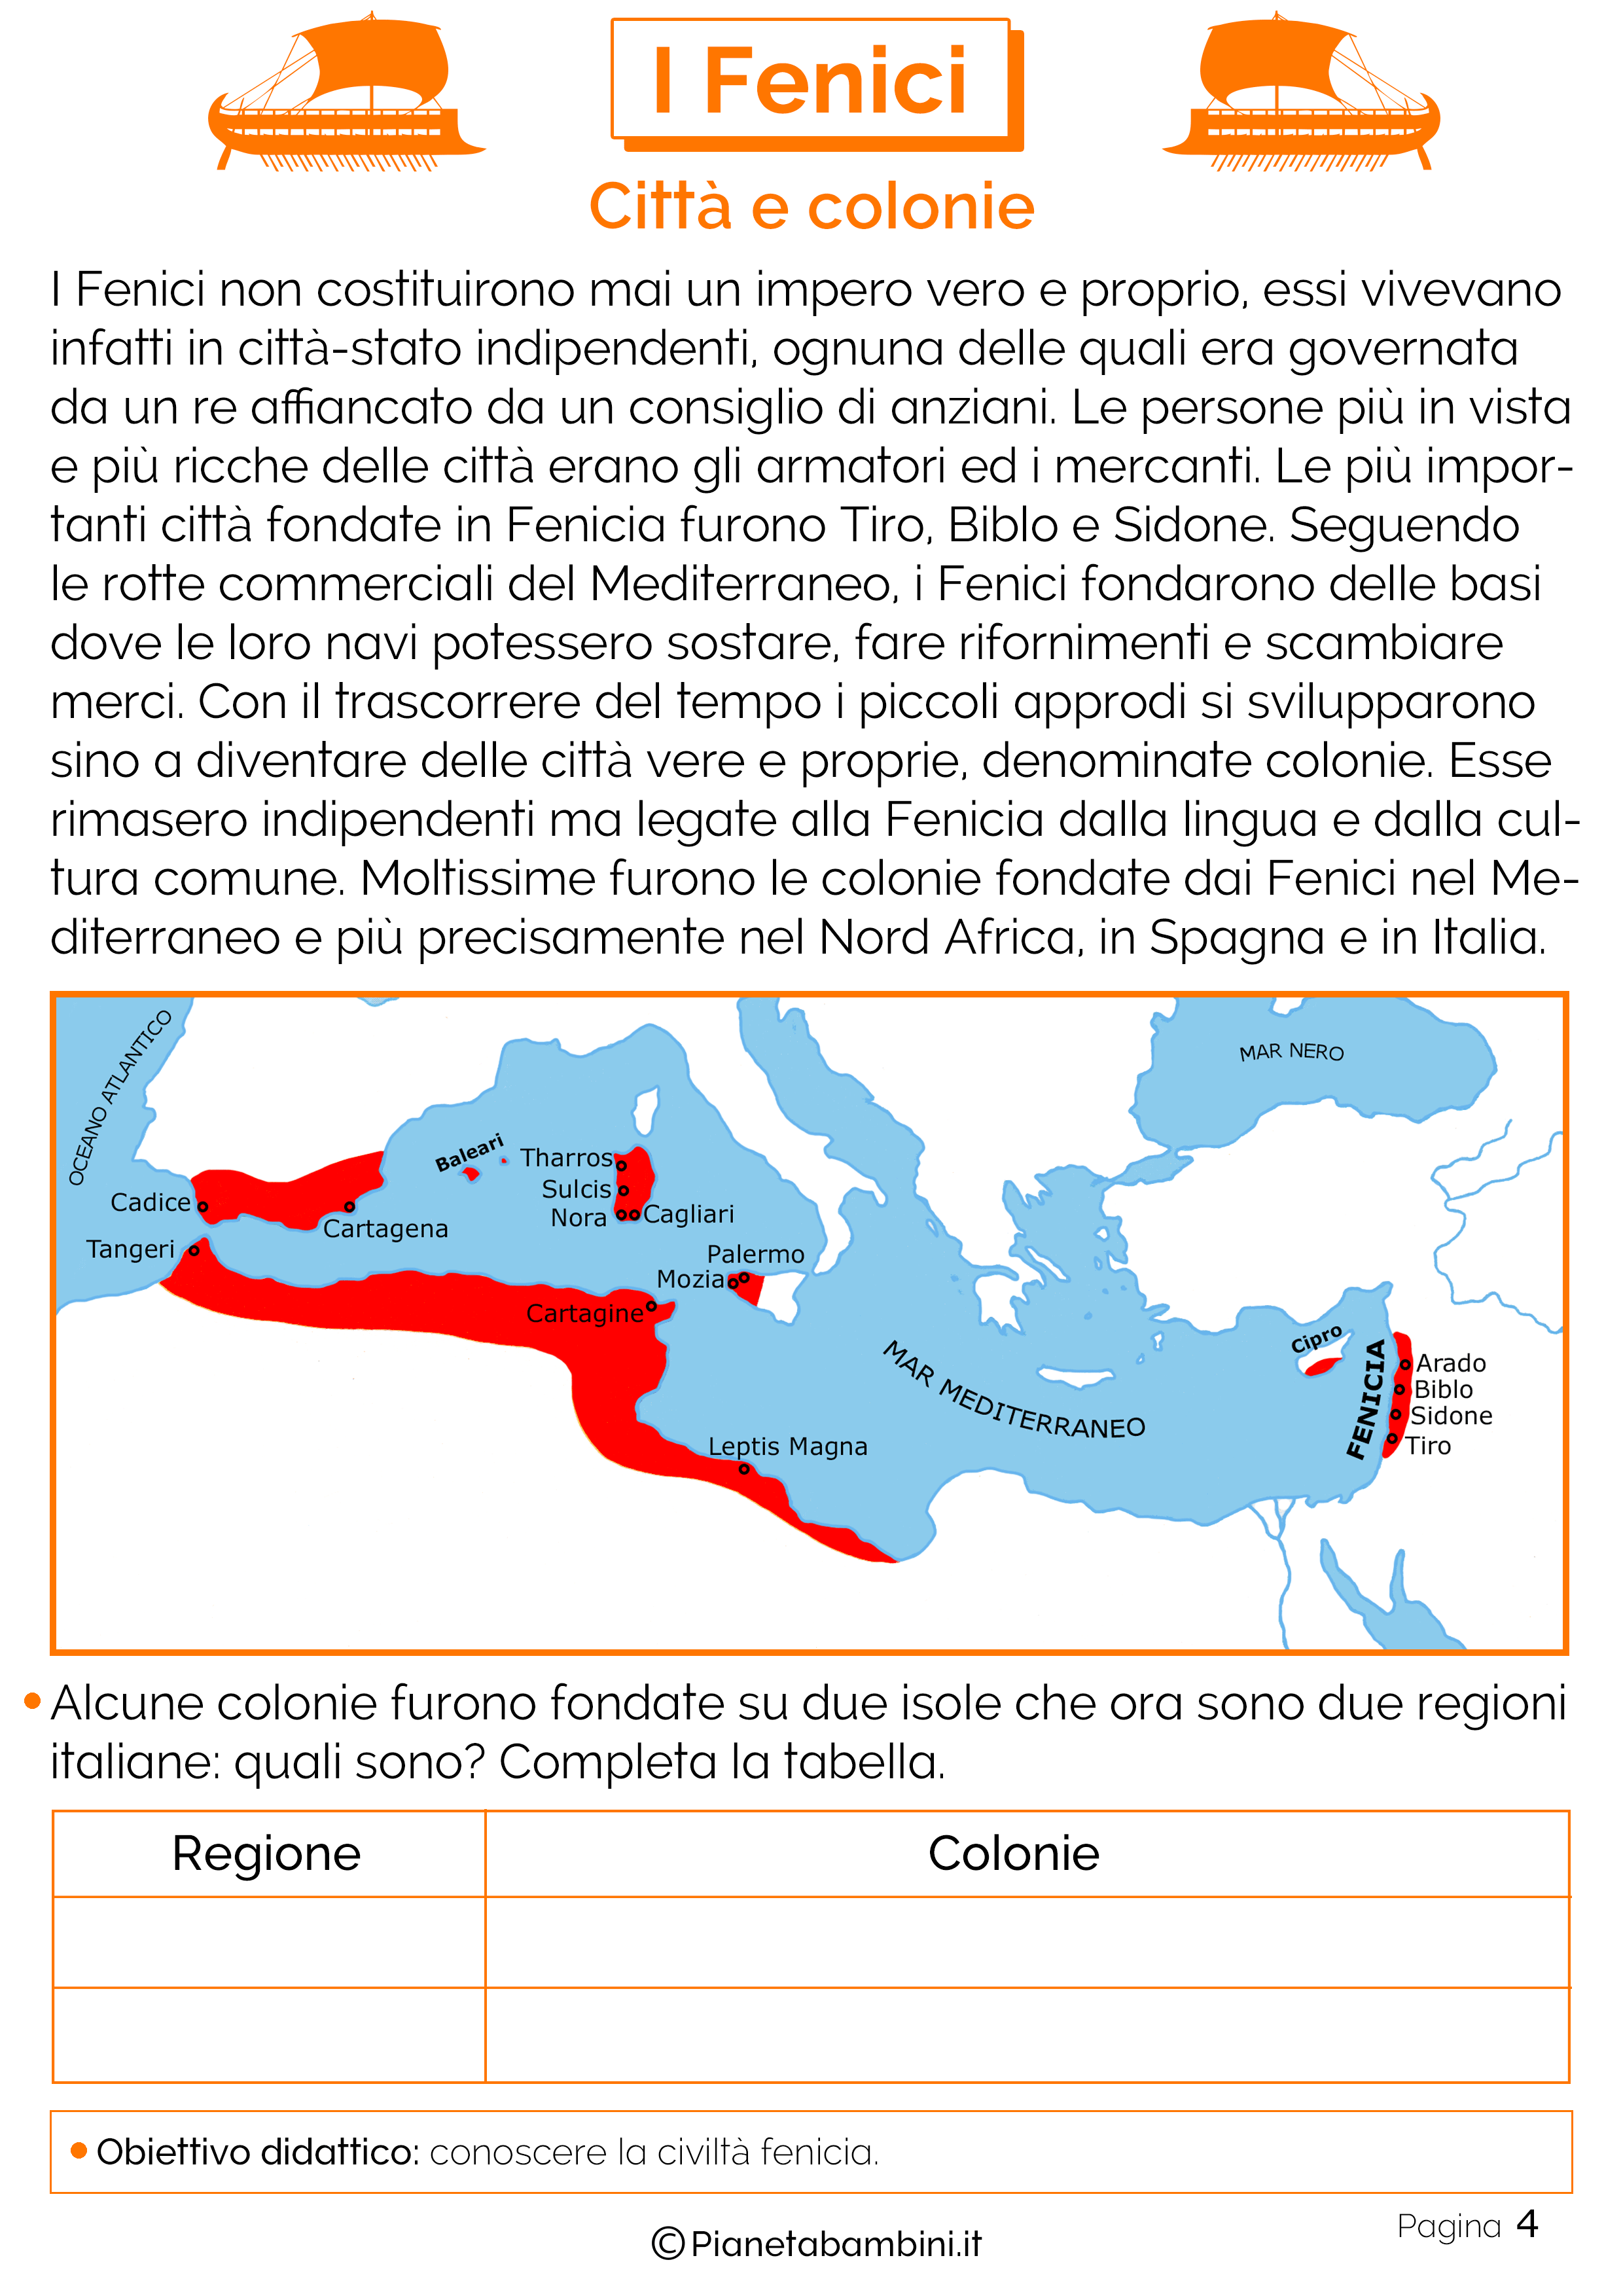 Le città e le colonie fenicie